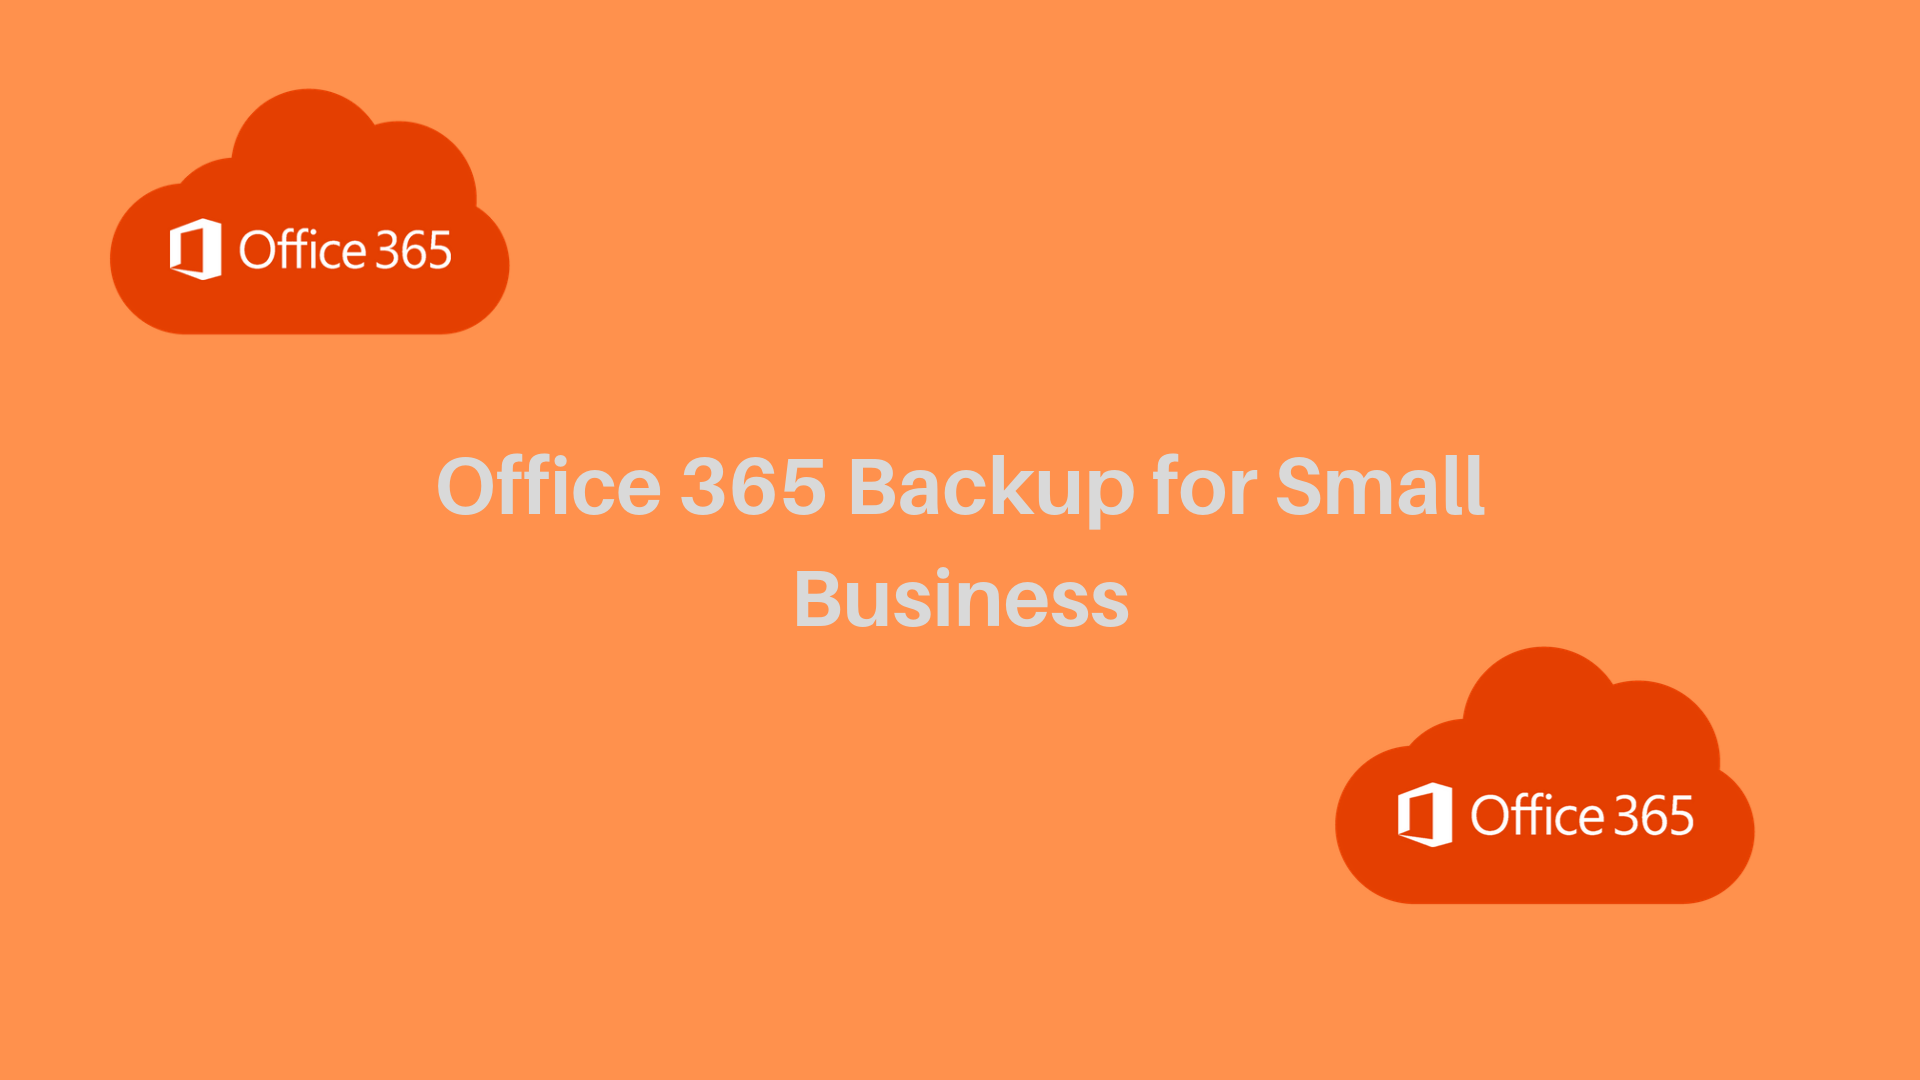 O365 backup for SMB